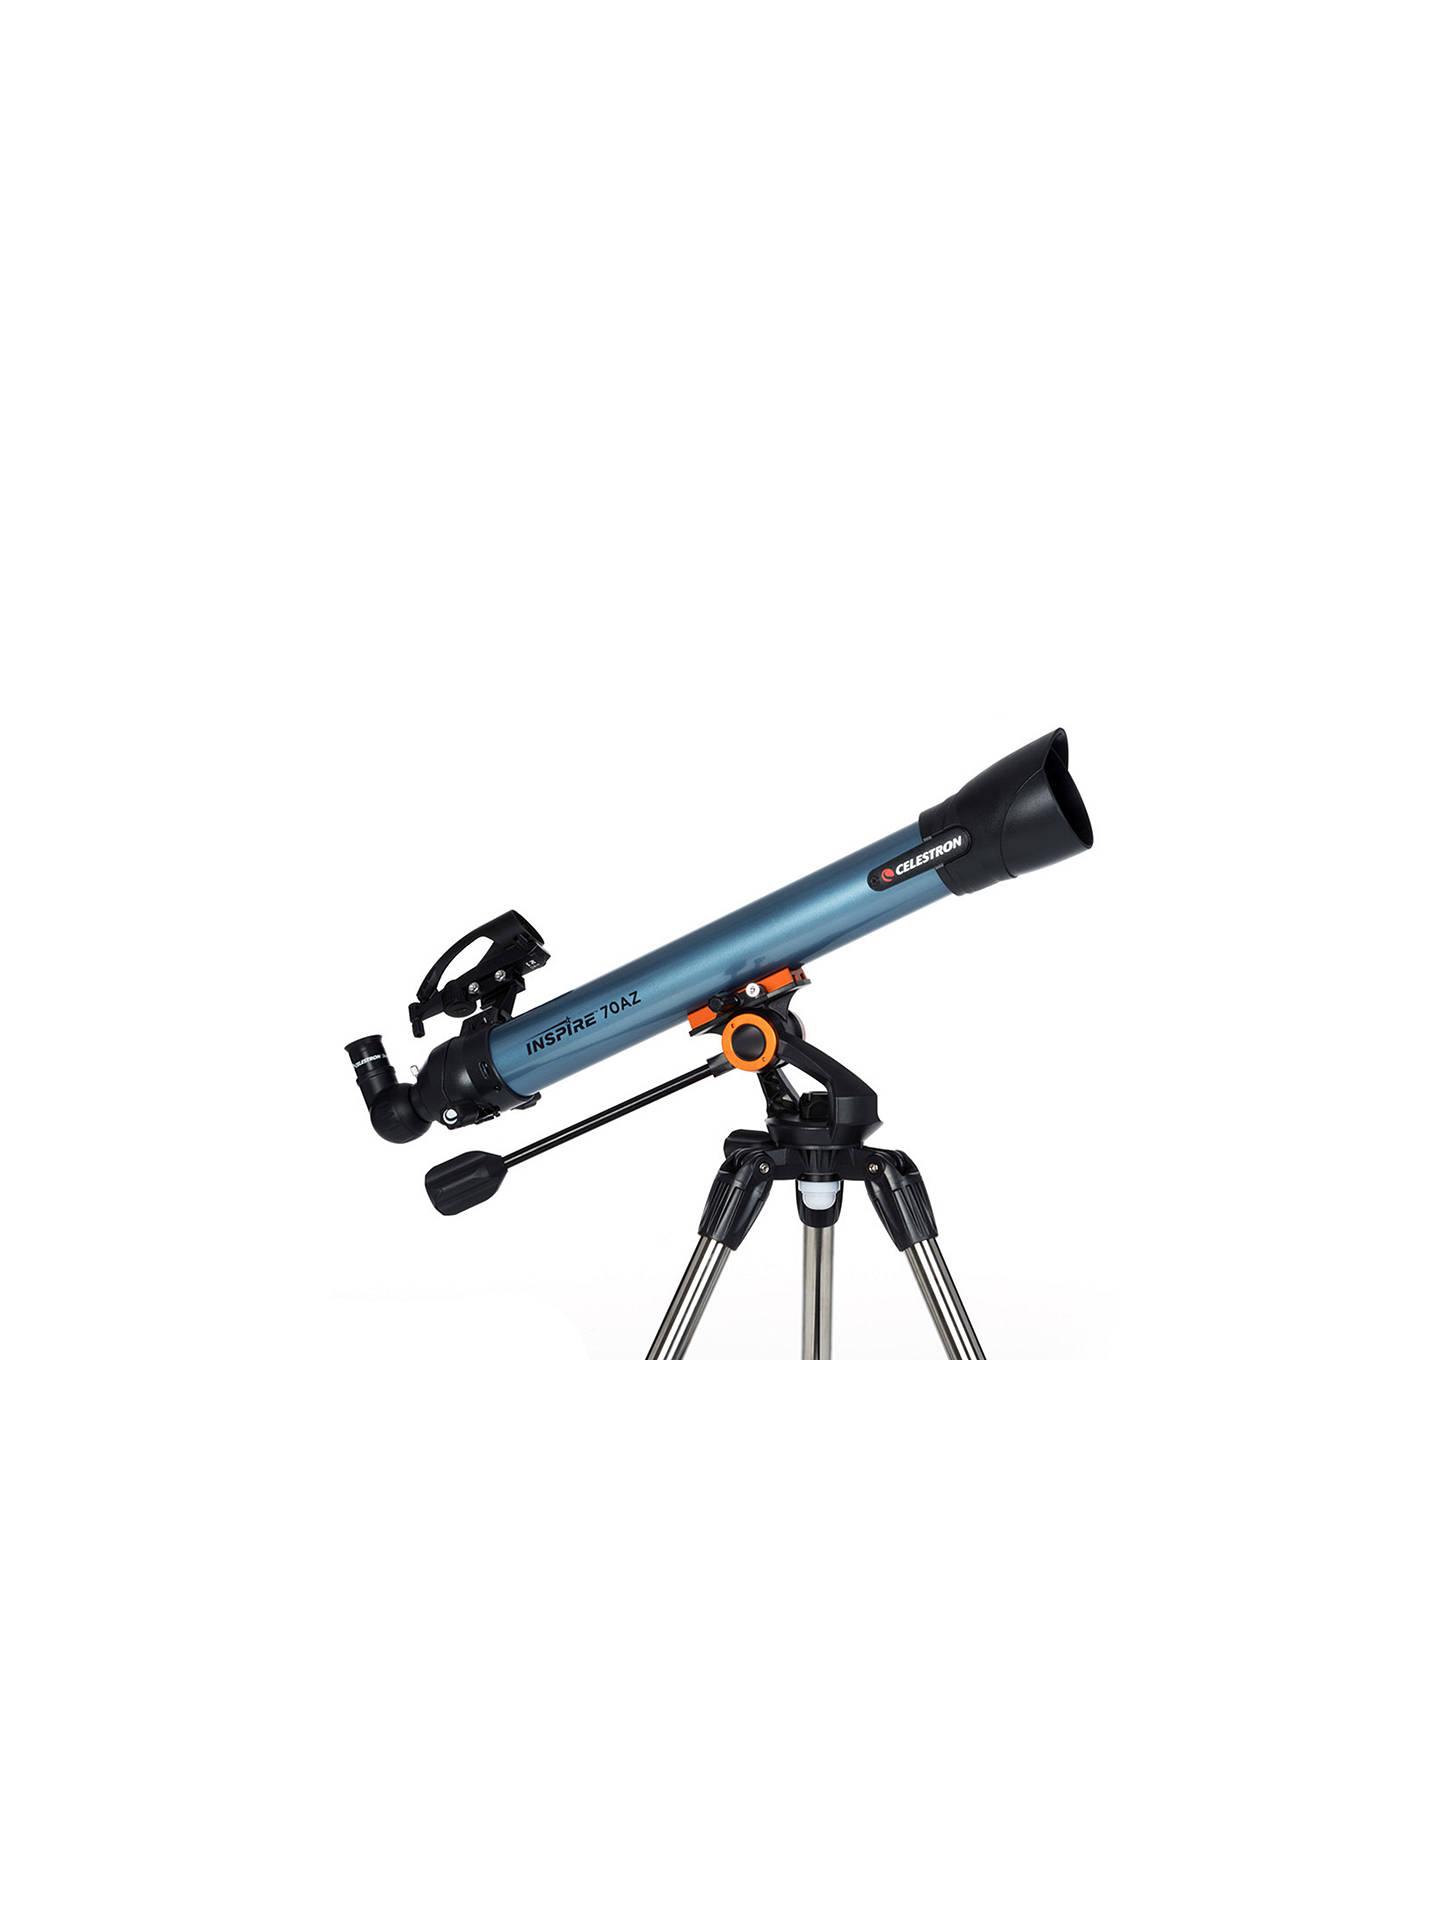 Celestron Inspire 70AZ Refractor Telescope with Smart